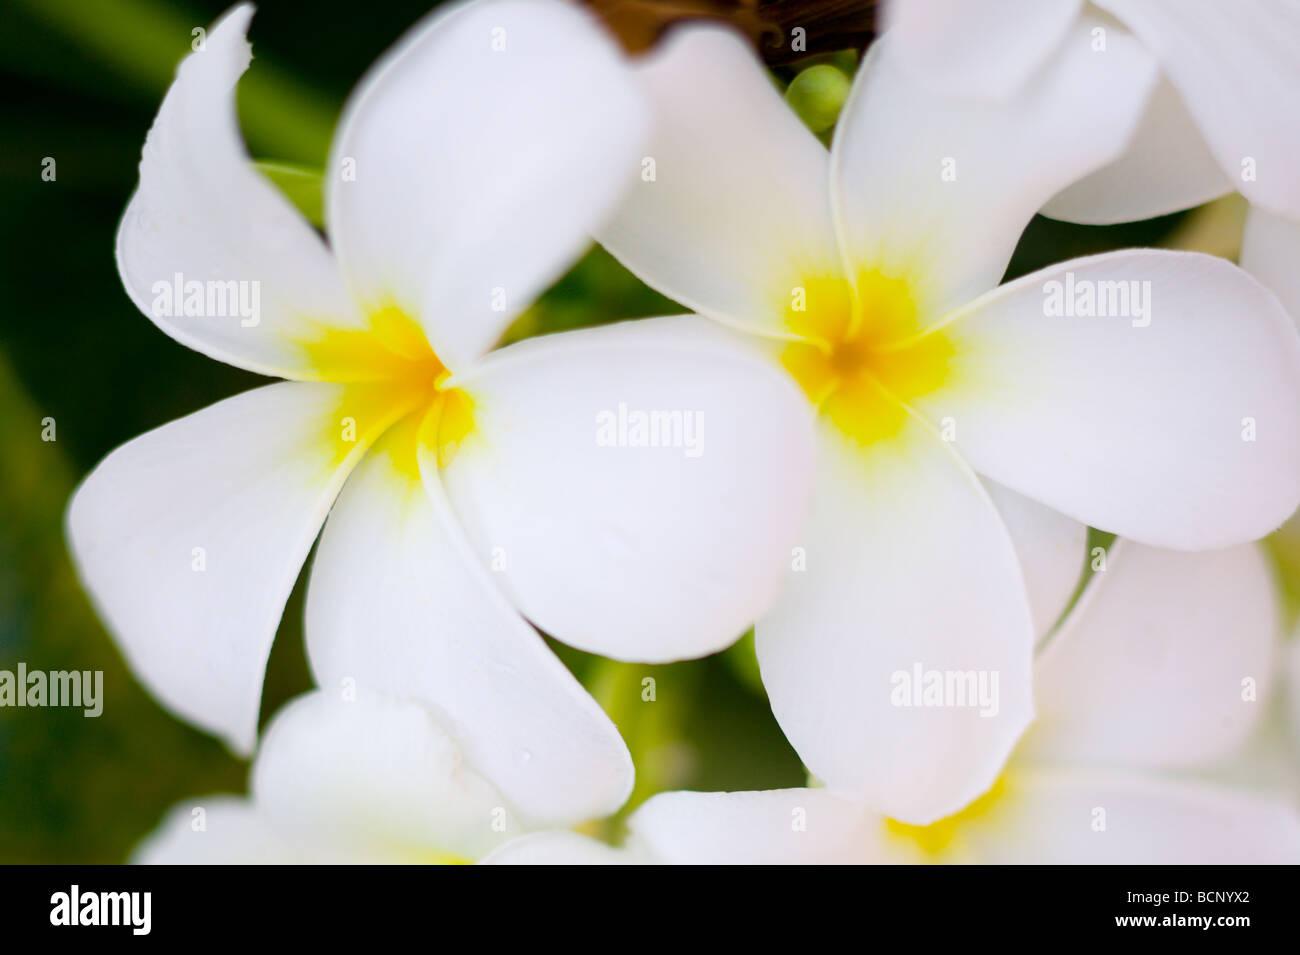 Two frangipani blooms - Stock Image